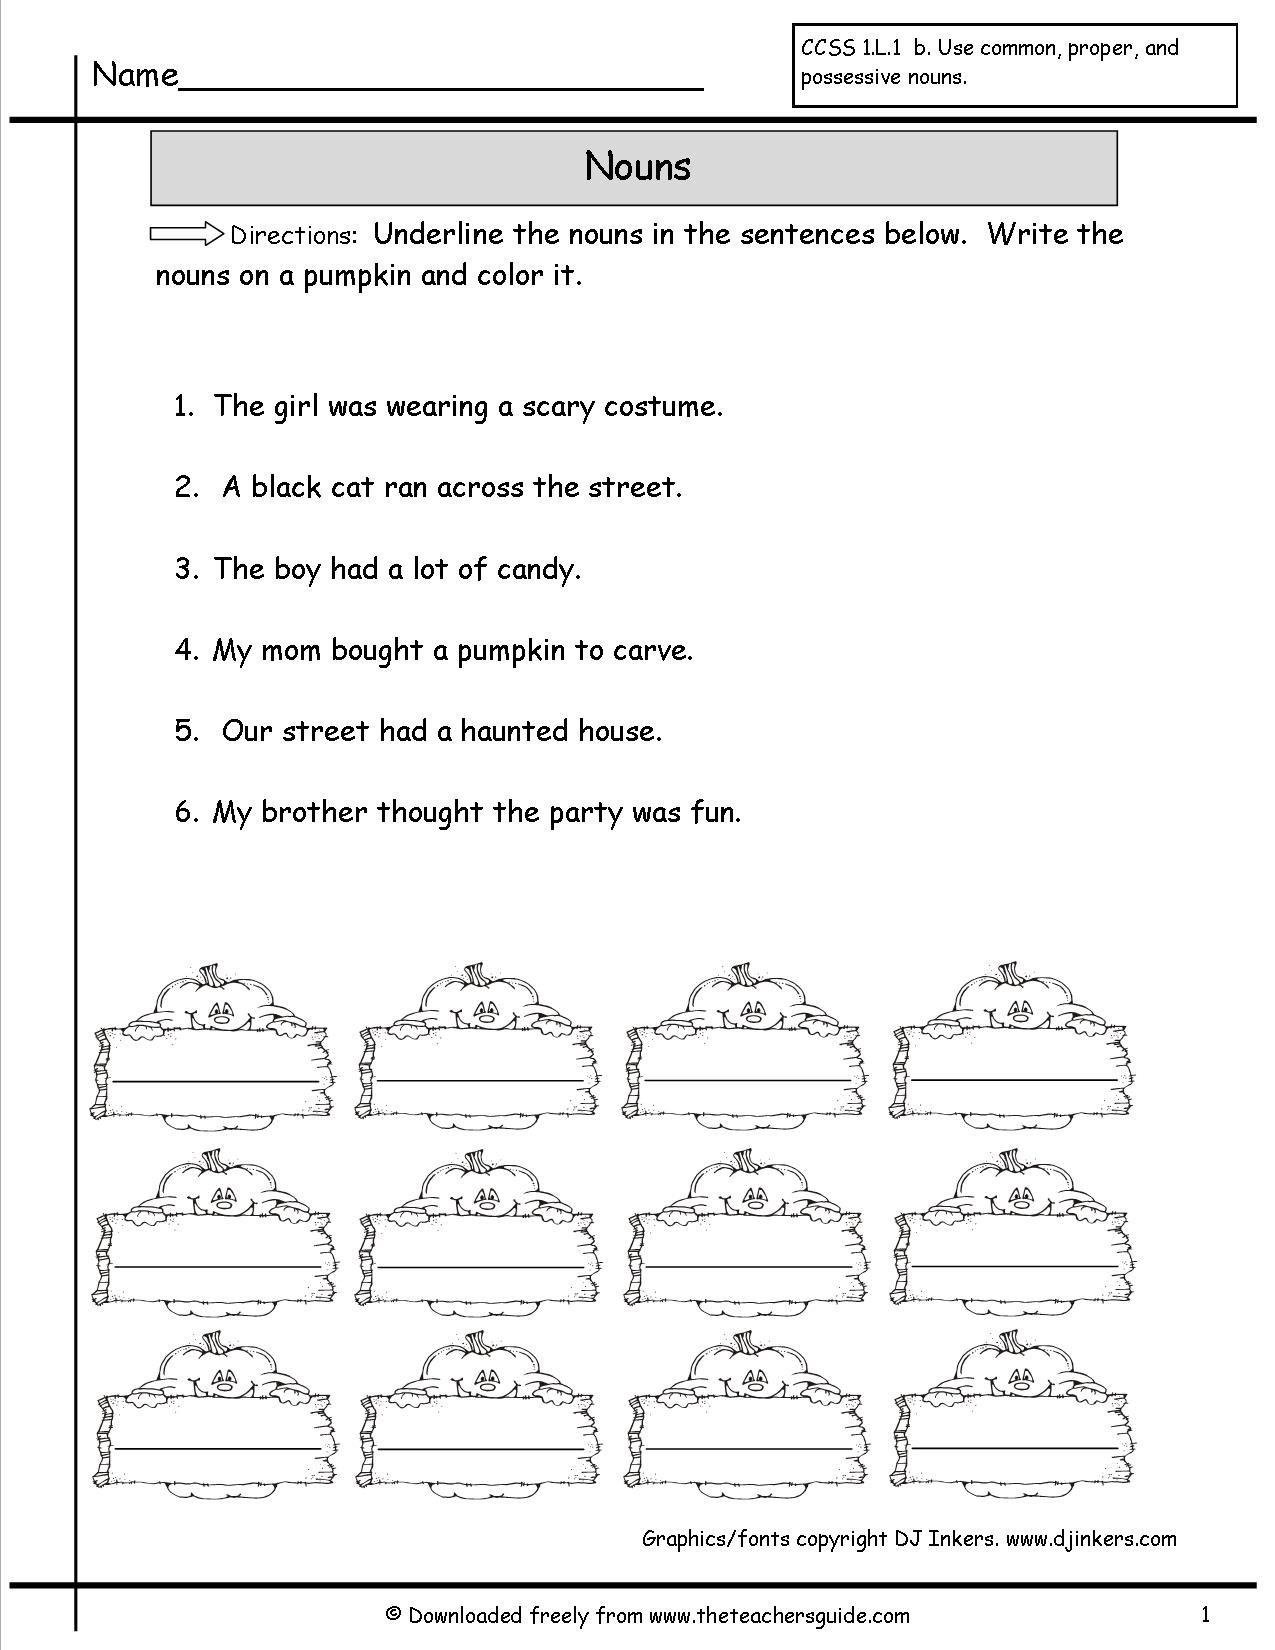 Nouns Color Pumpkins Worksheet